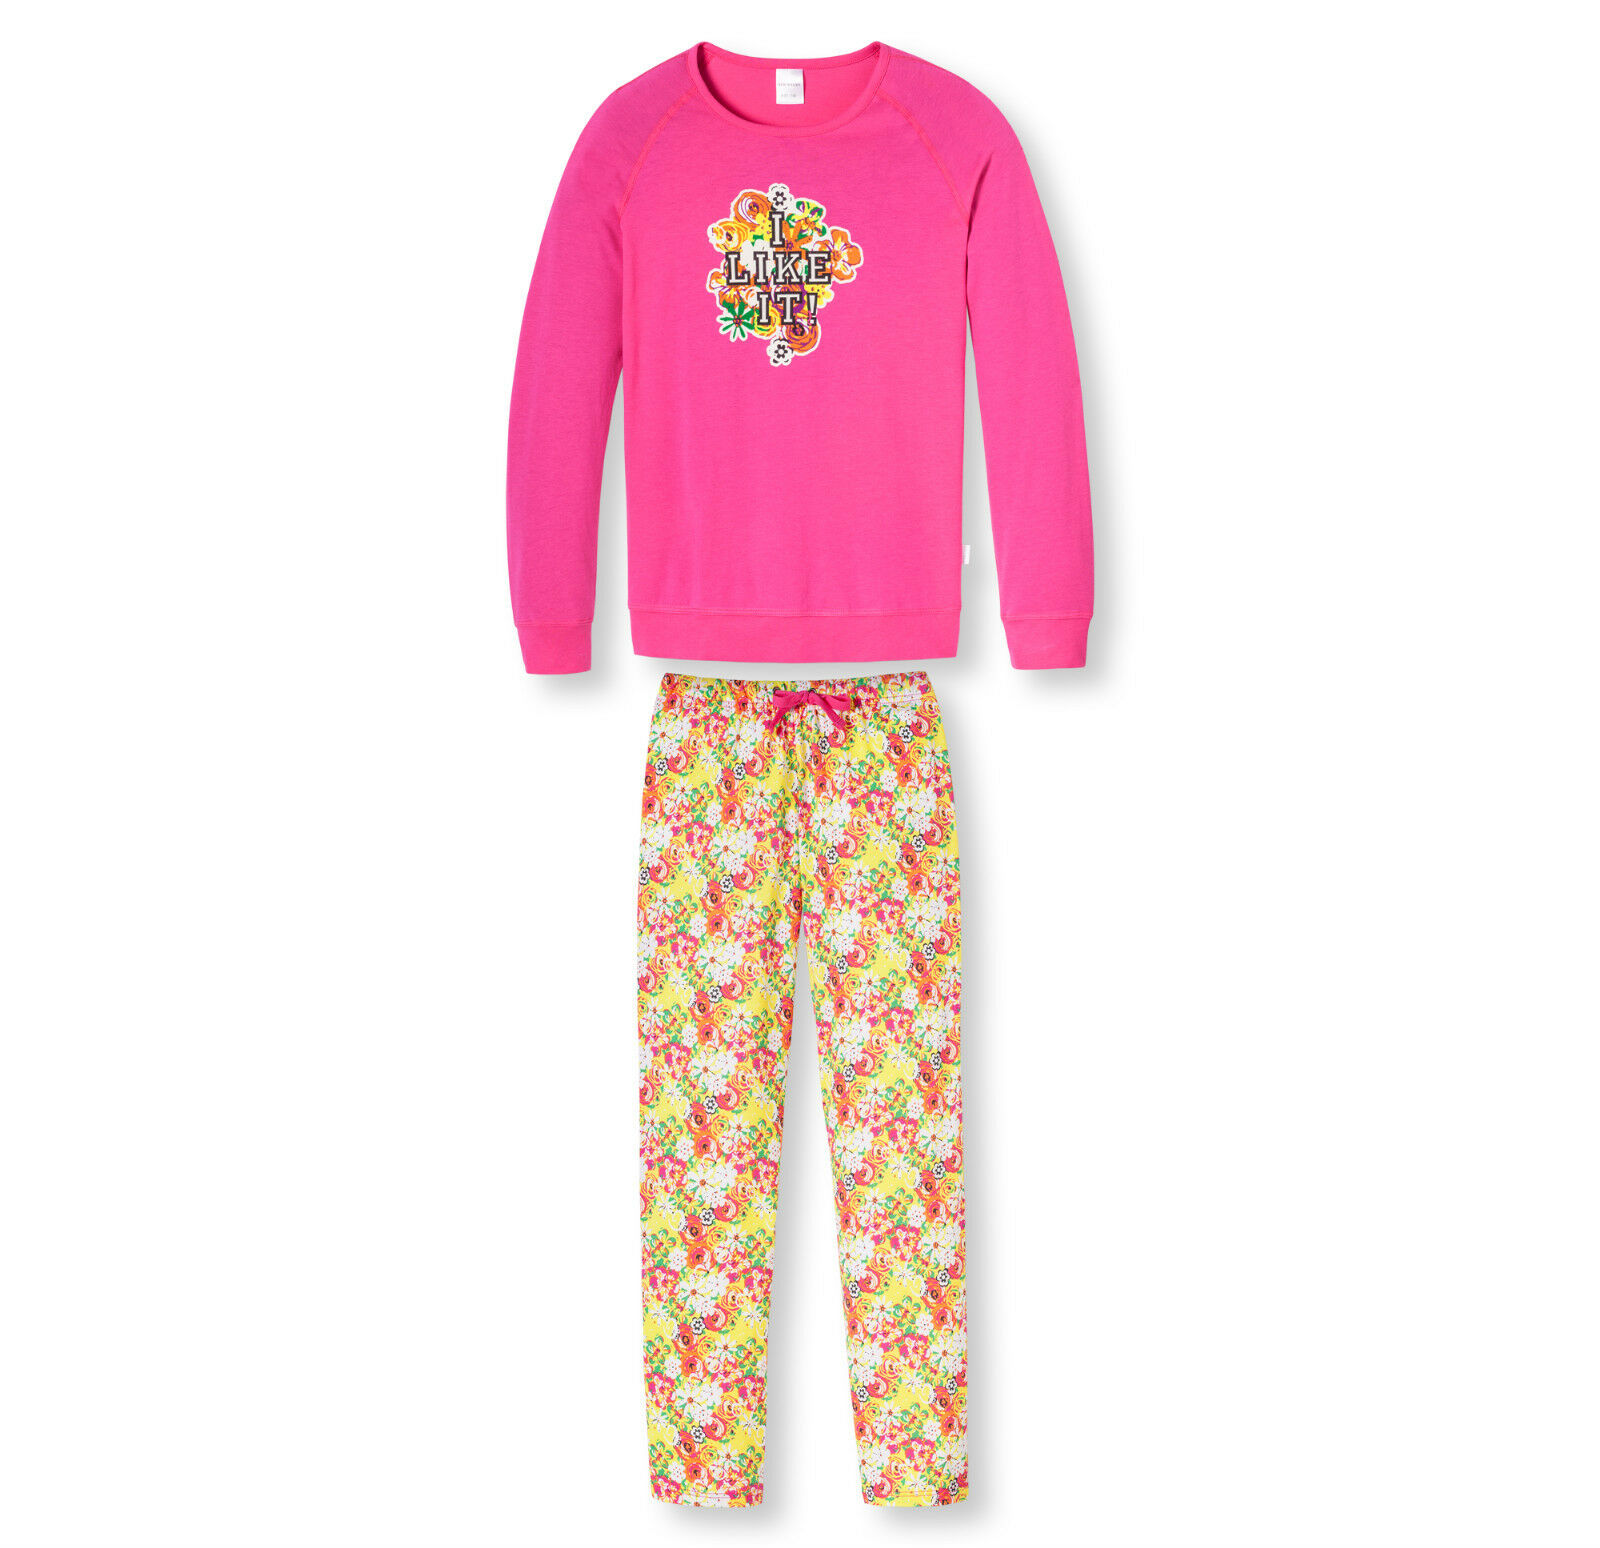 Schiesser fille pyjama long motif retro taille 140 152 164 176 pyjama NEUF